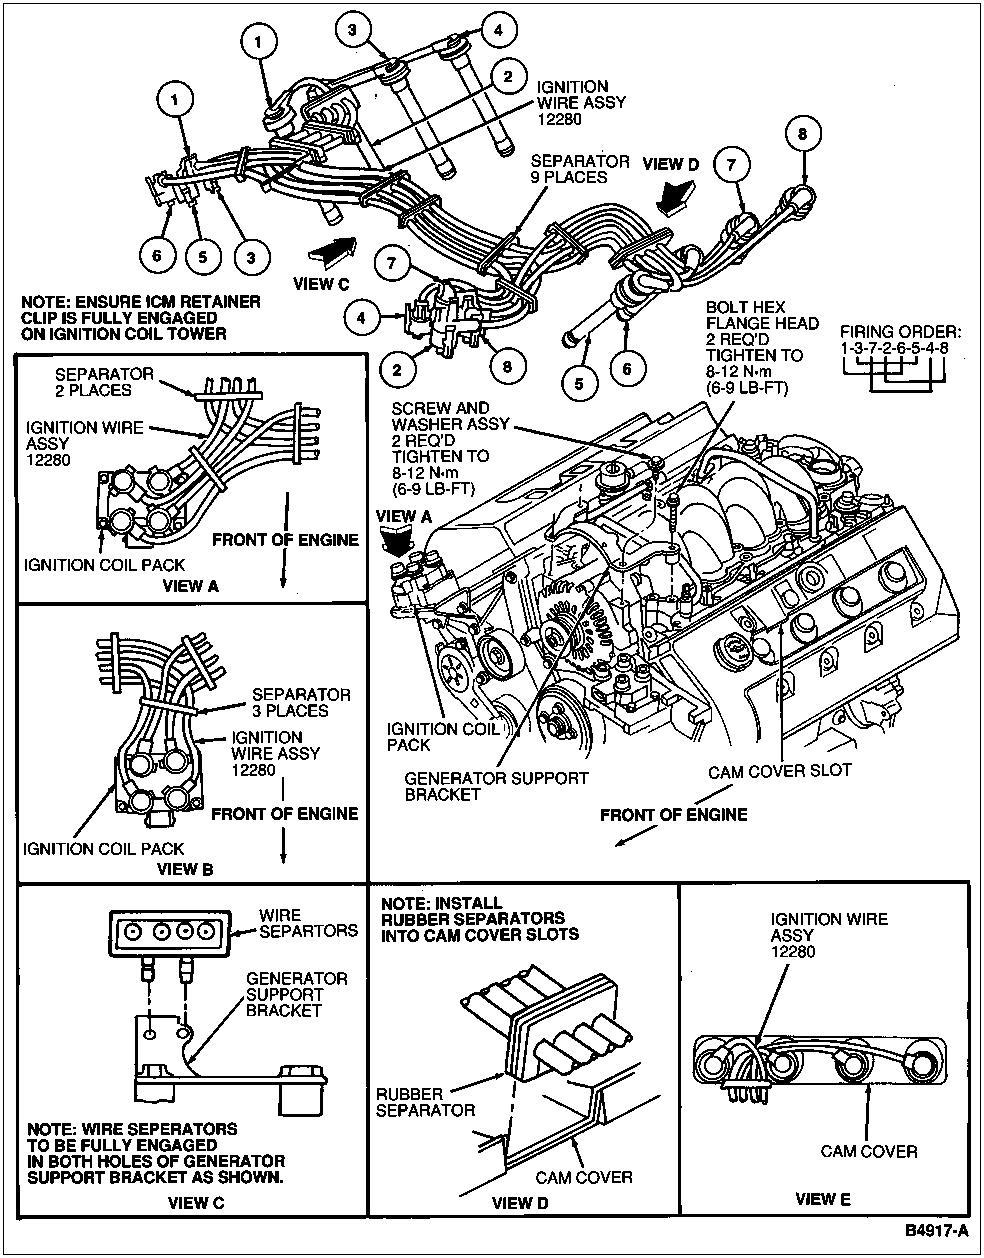 citroen spark plug wire diagram image 5